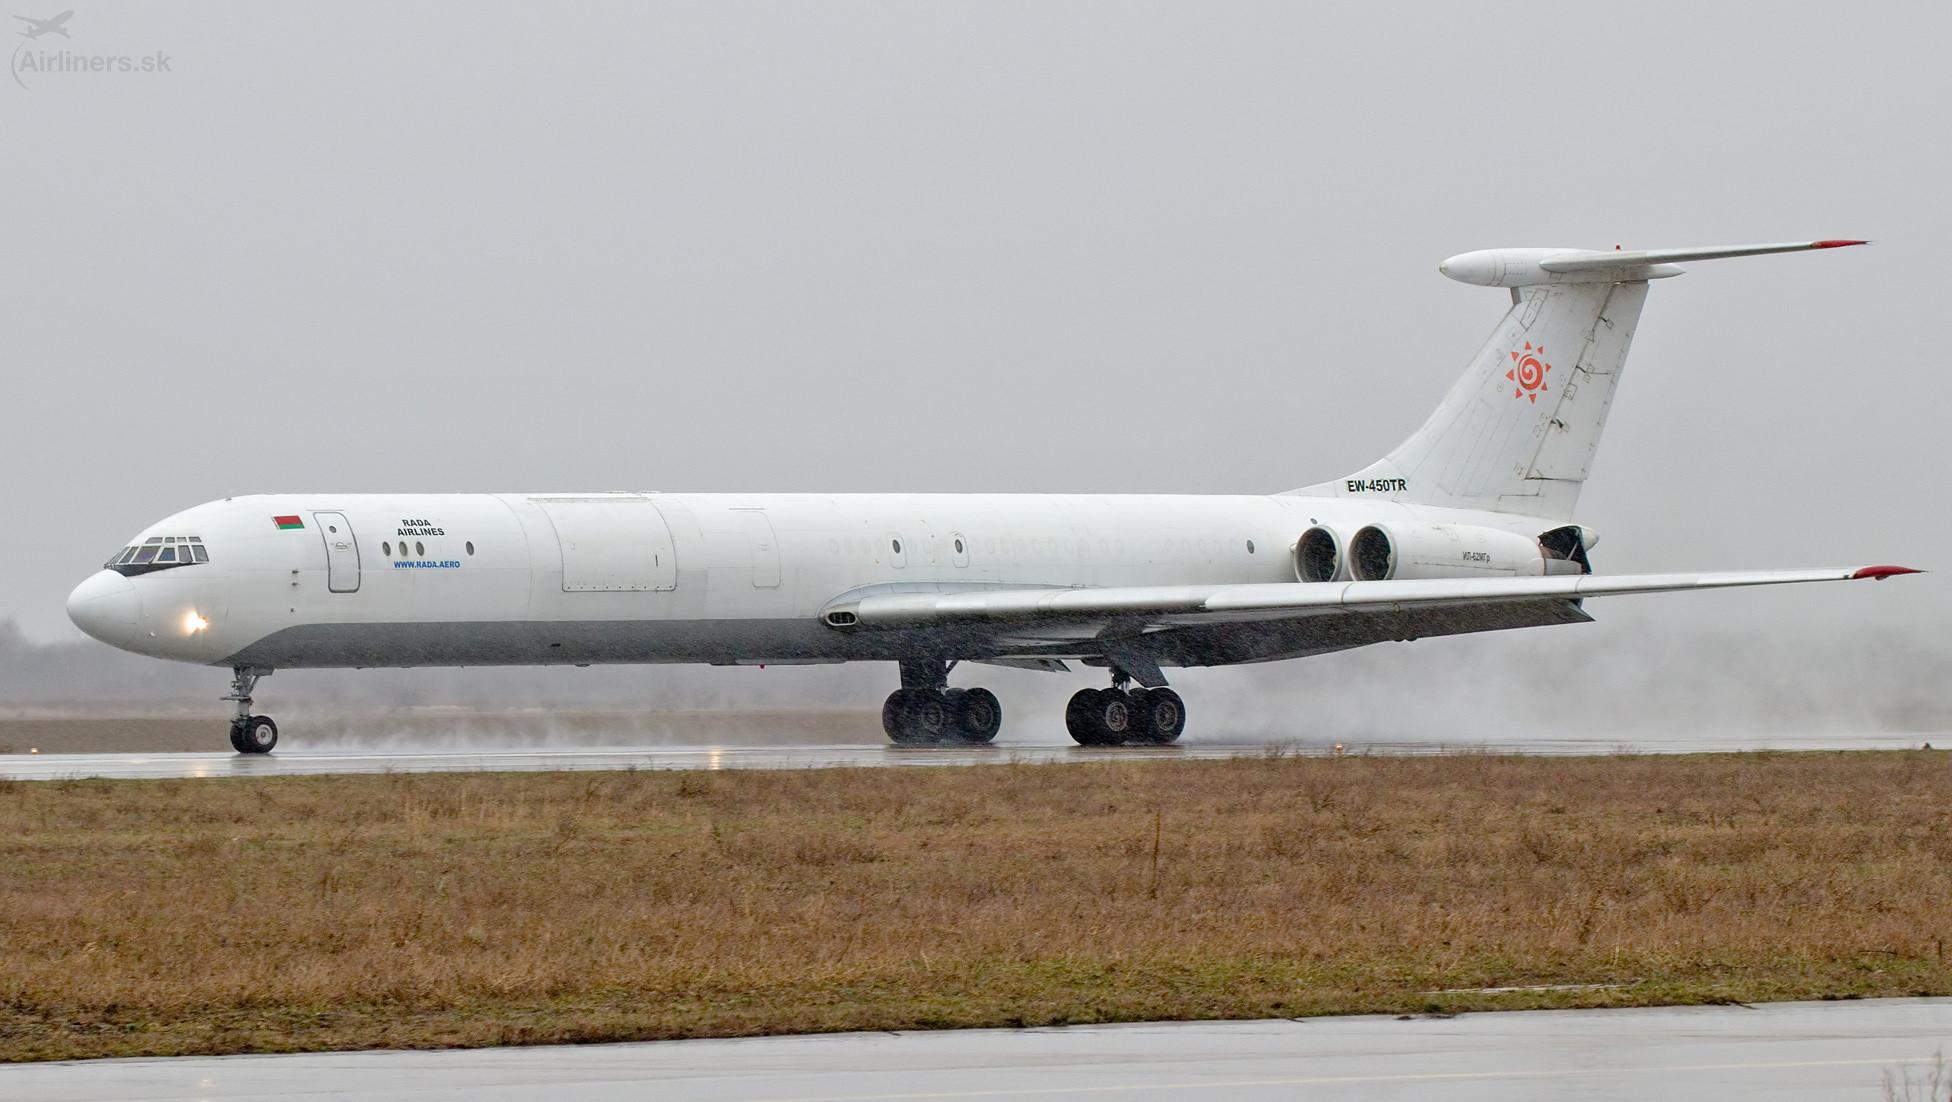 EW-450TR